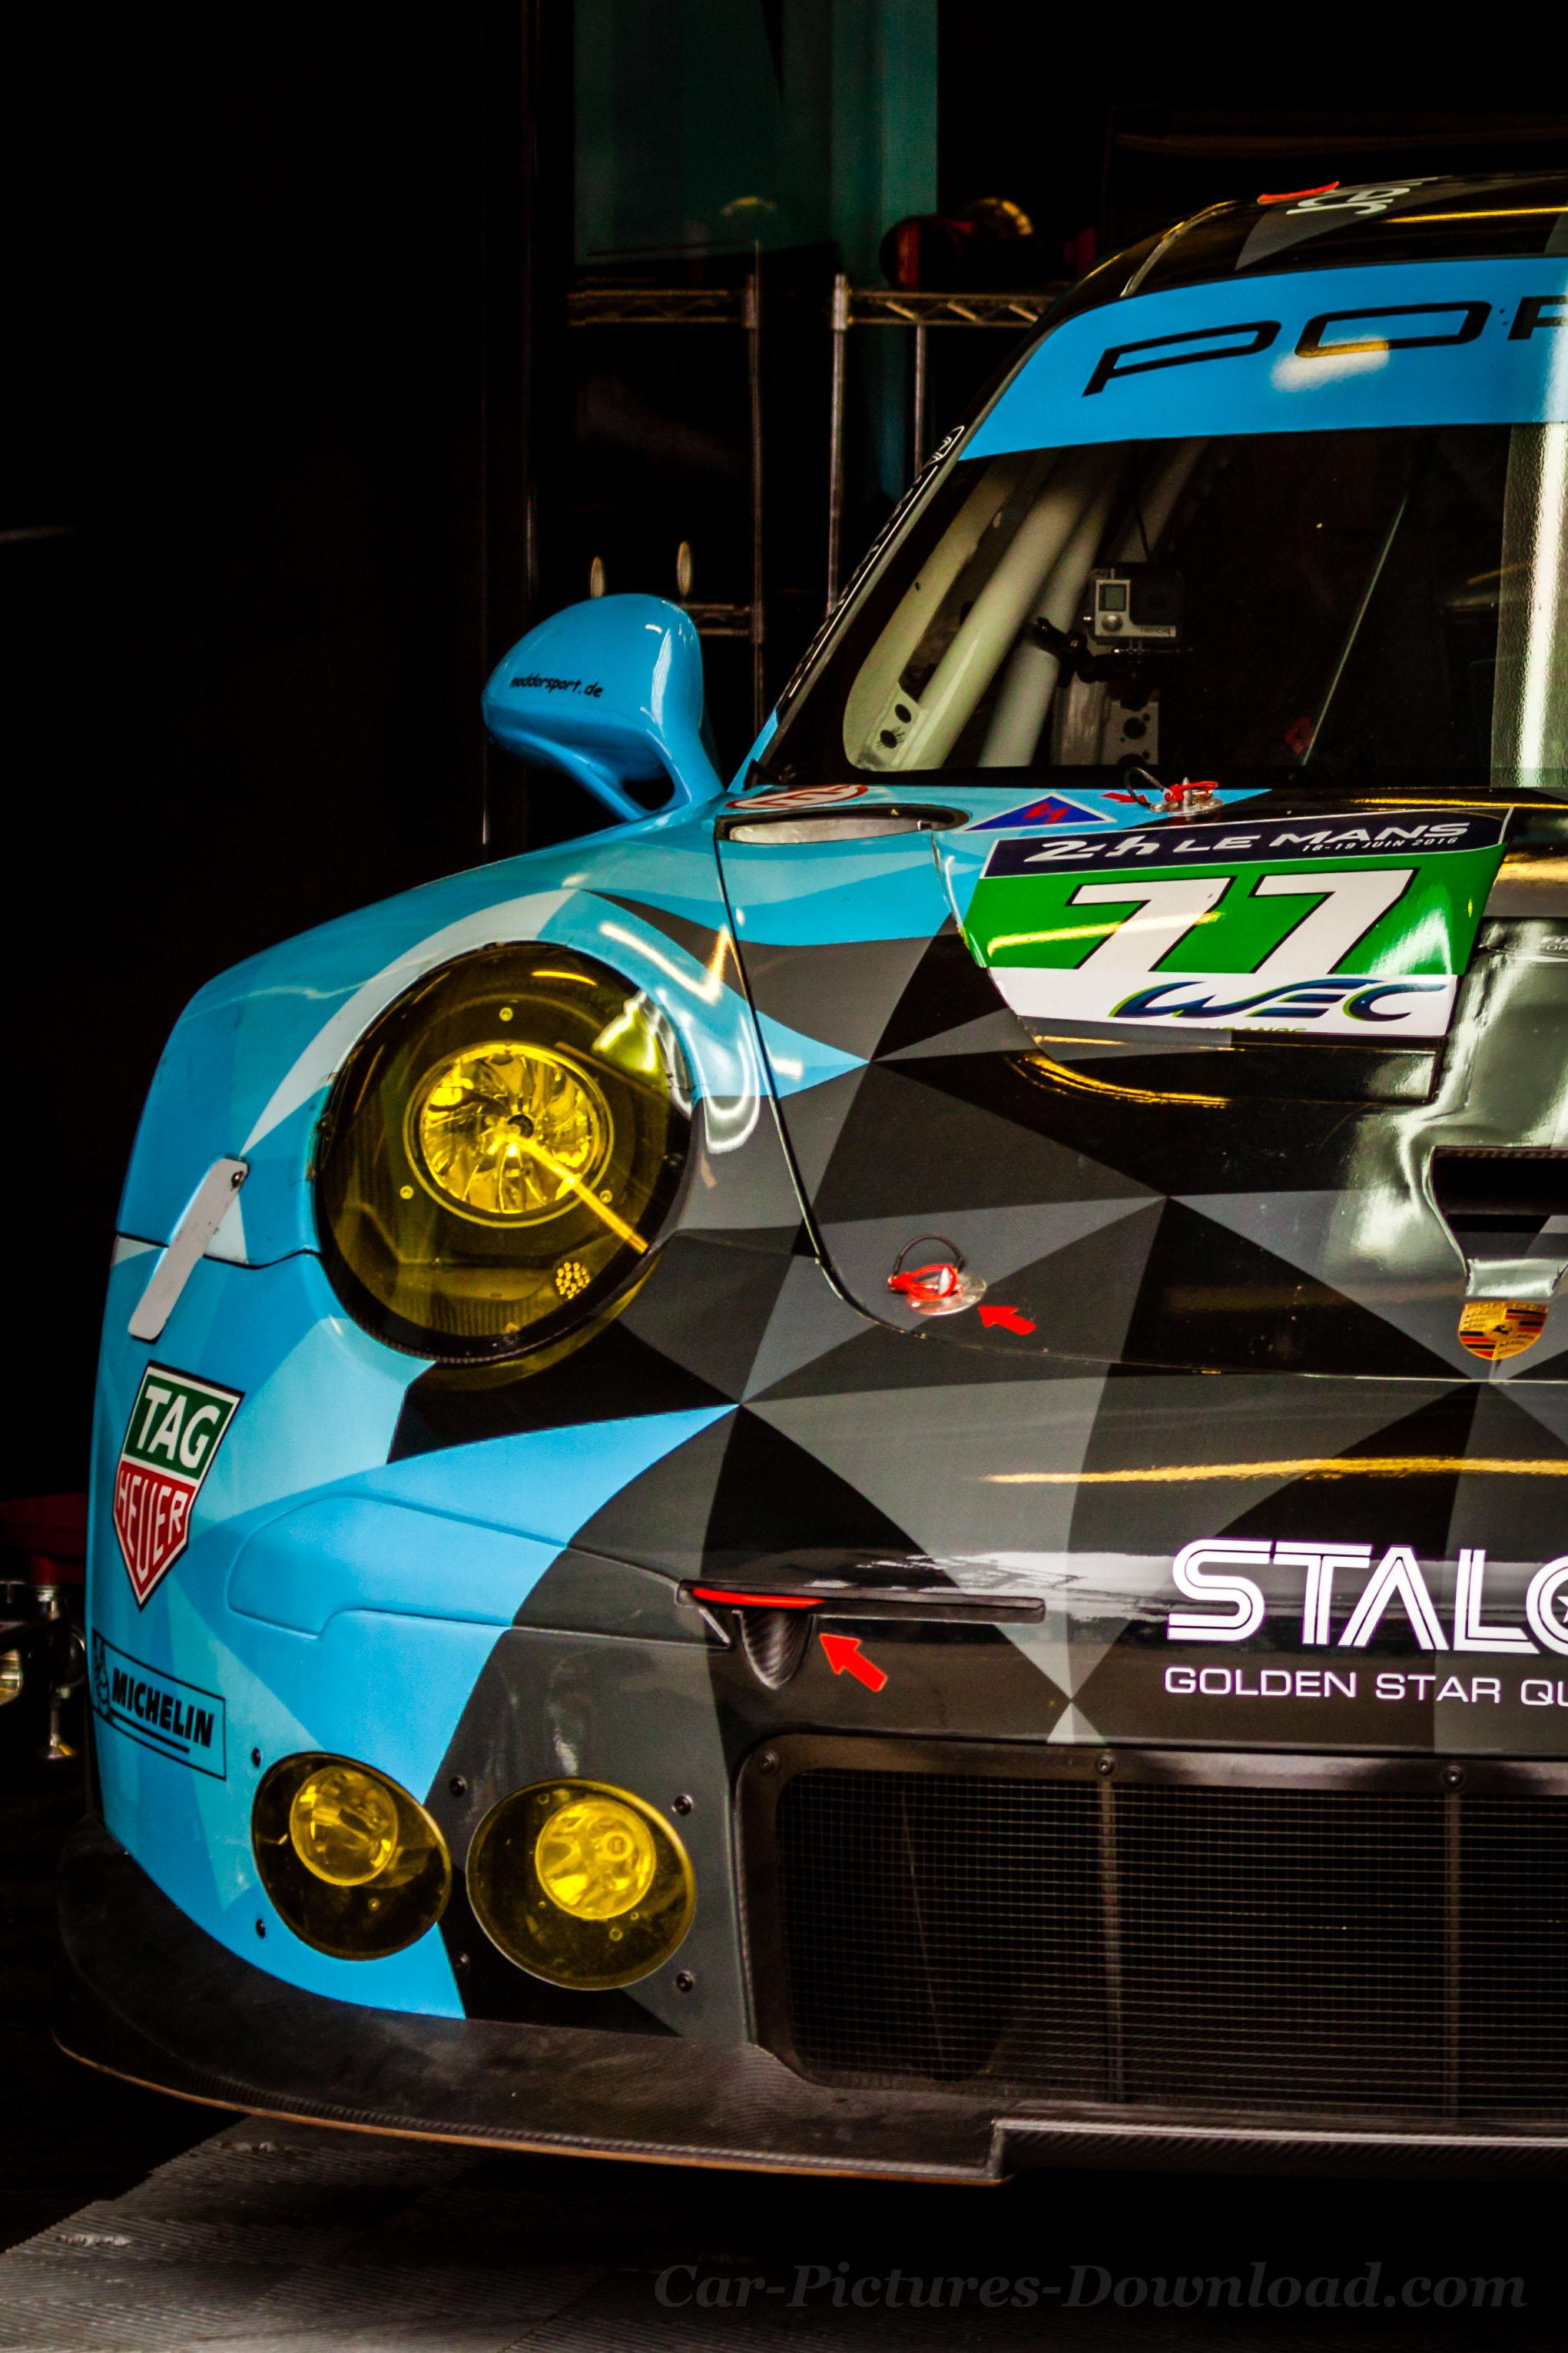 Porsche 911 Rsr Race Car Wallpaper Image Iphone - Iphone 4k Wallpaper For Mobile - HD Wallpaper